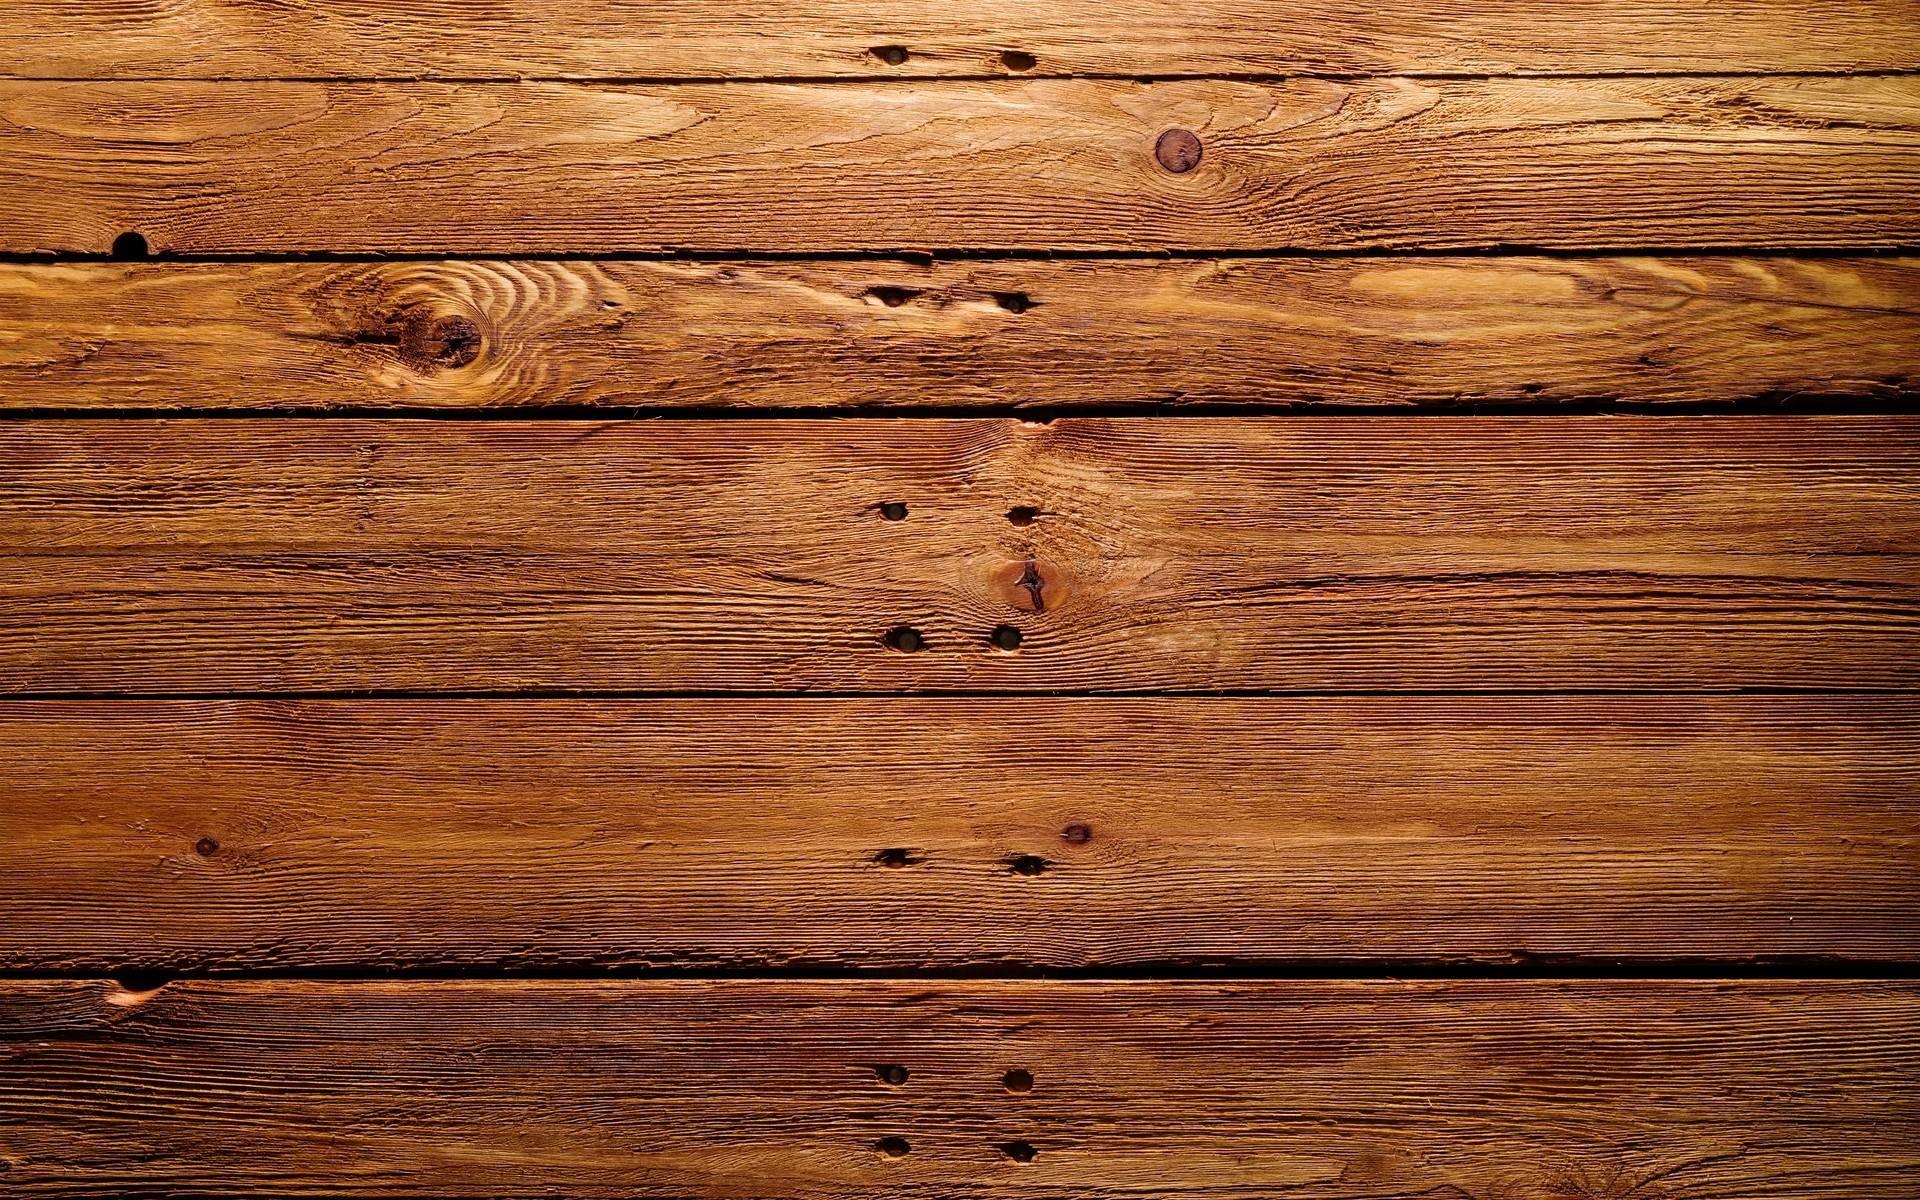 Hd Wood Wallpaper